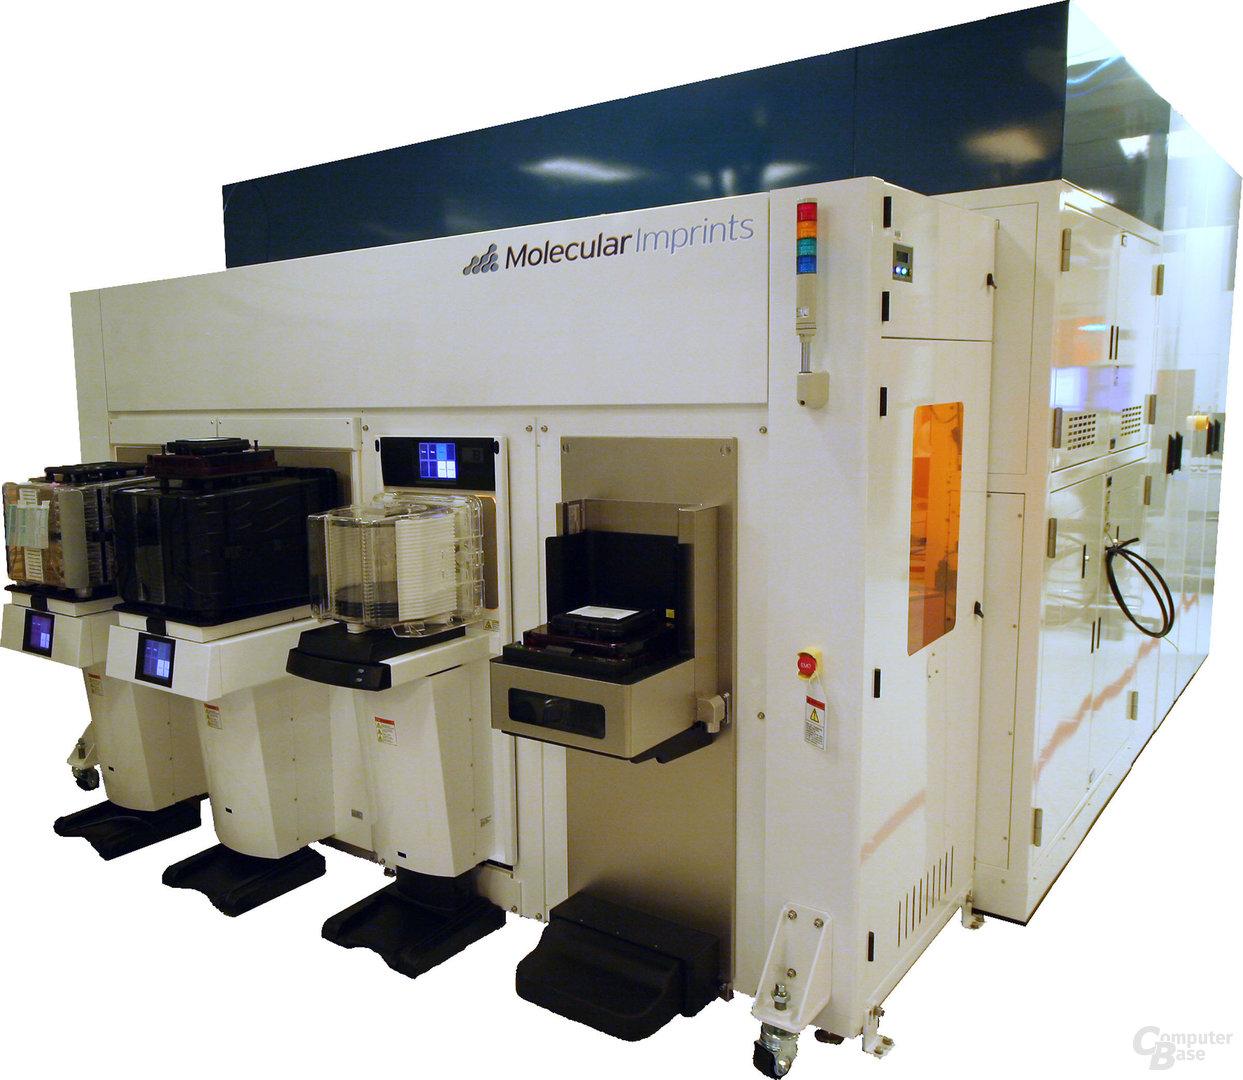 Molecular Imprints Imprio 450 Lithography System.